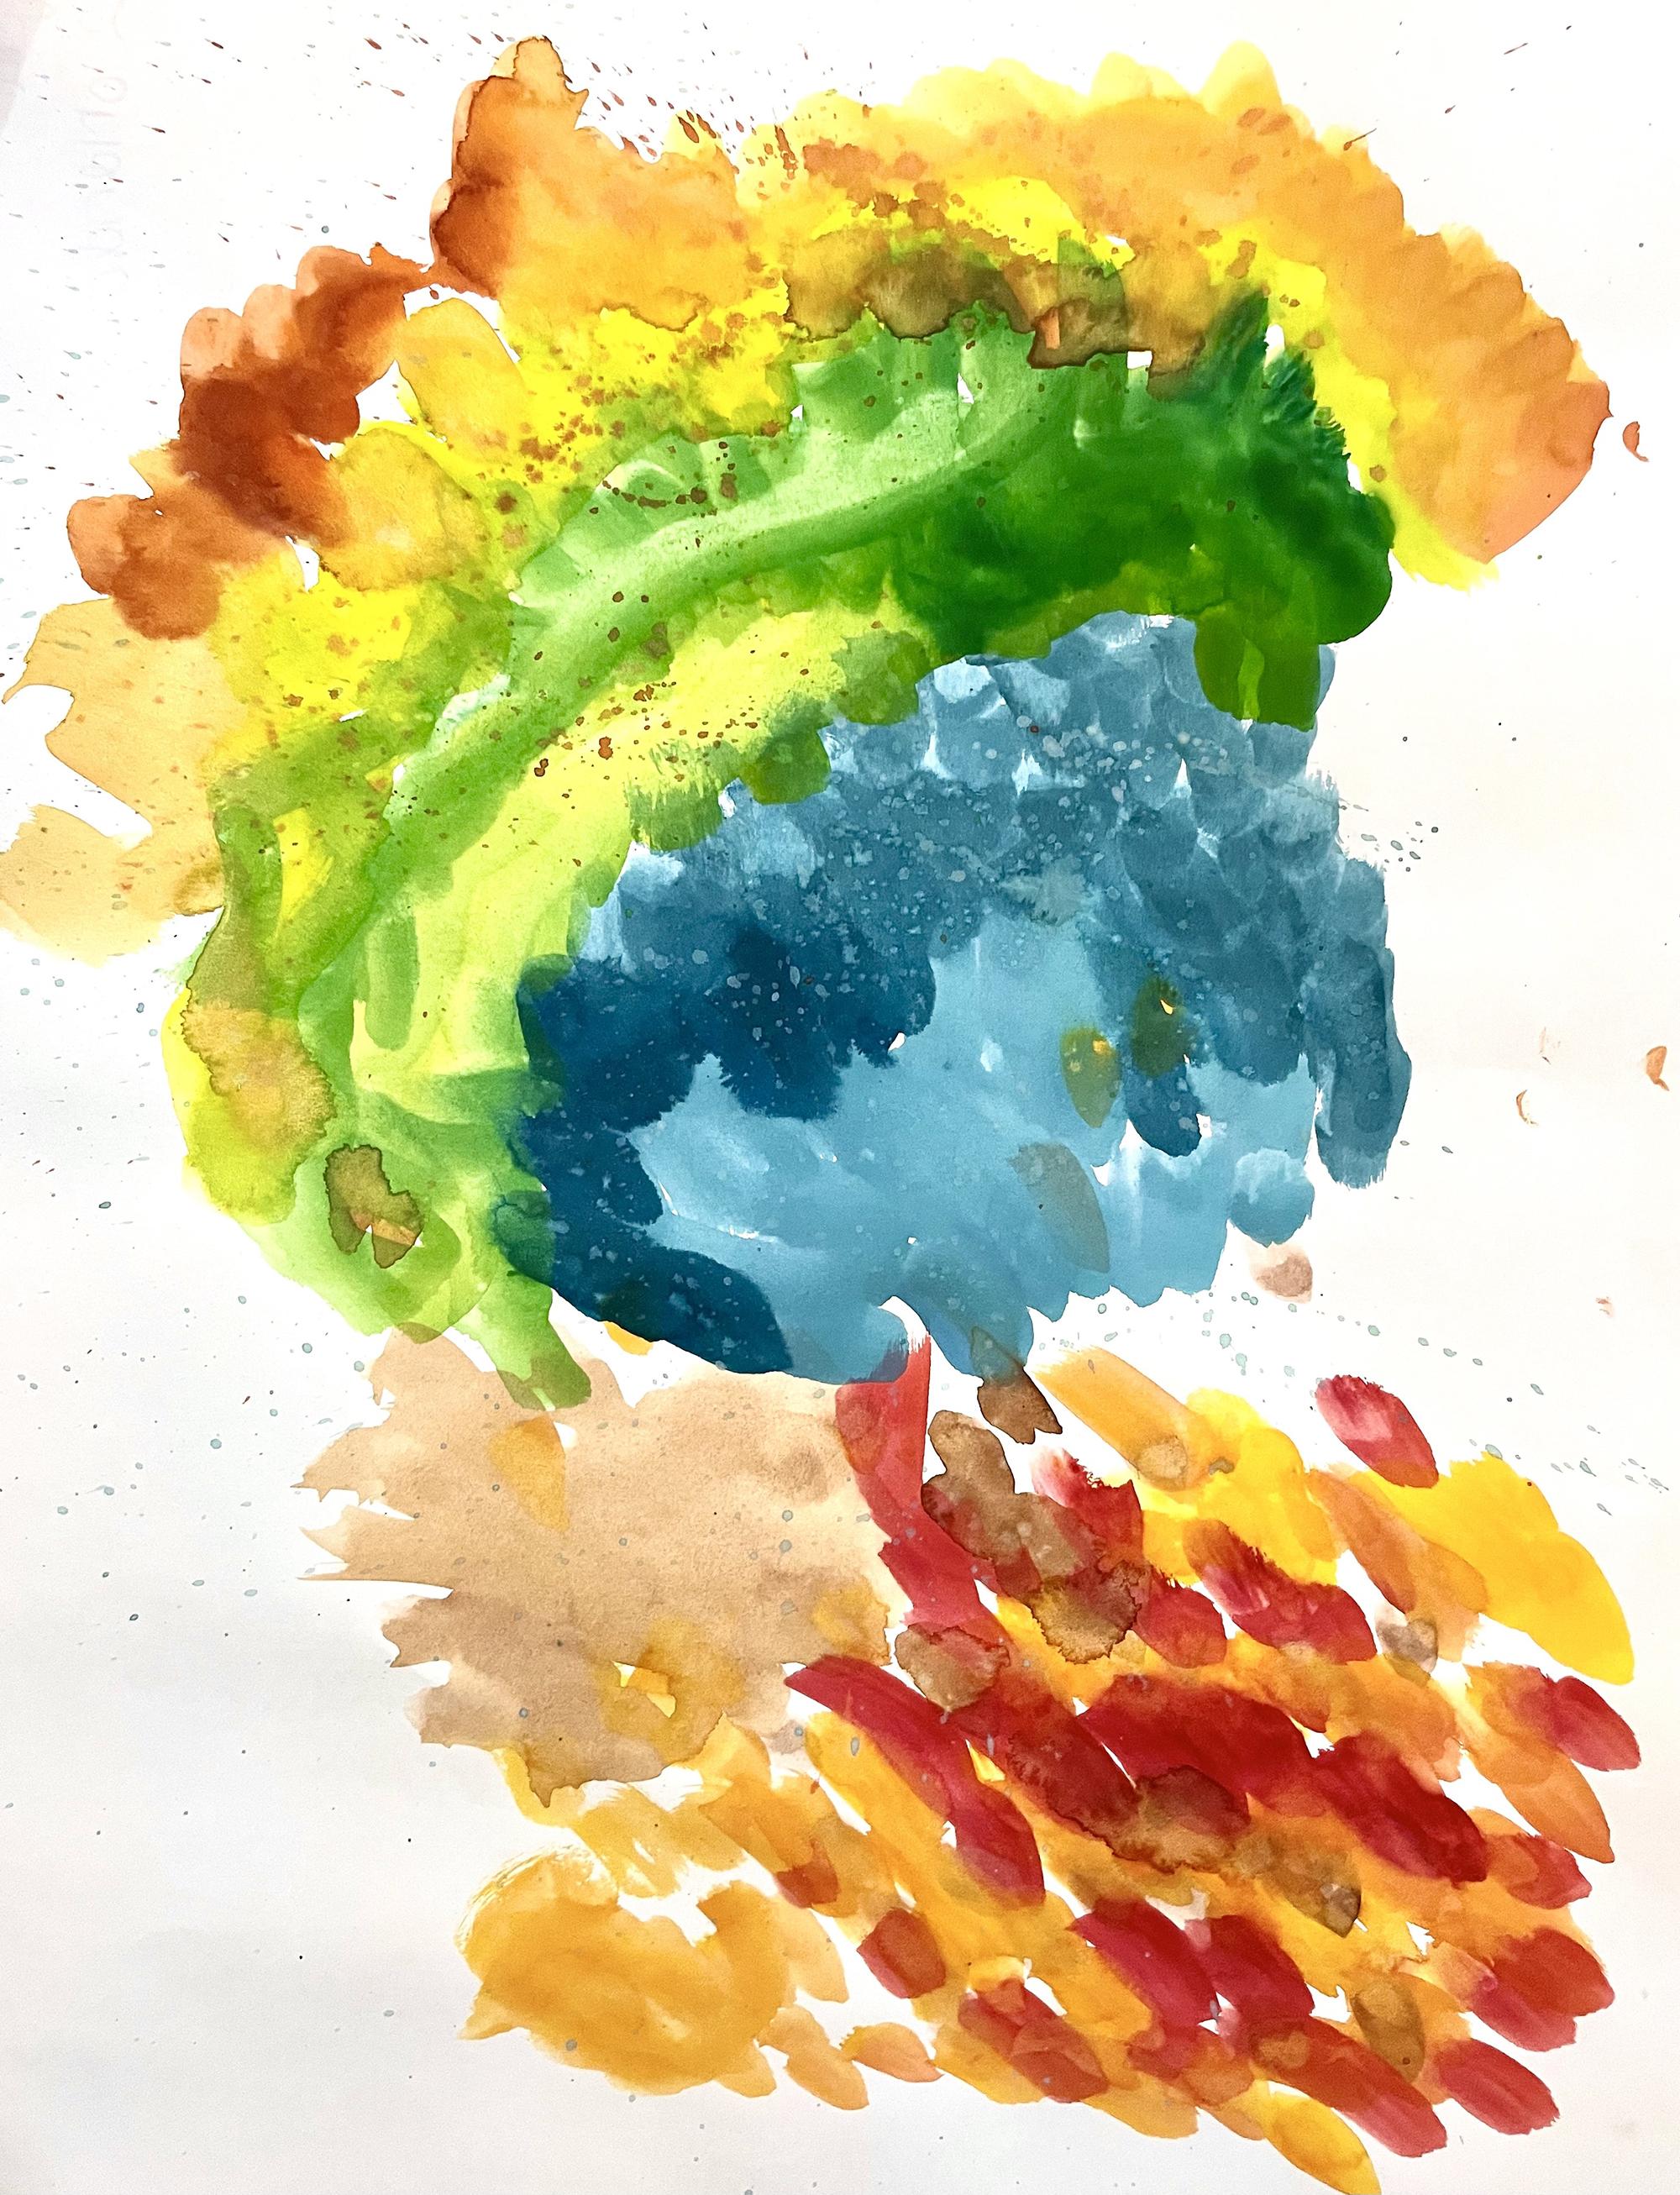 1st. Alyssa Huang, Watercolor sensations 1